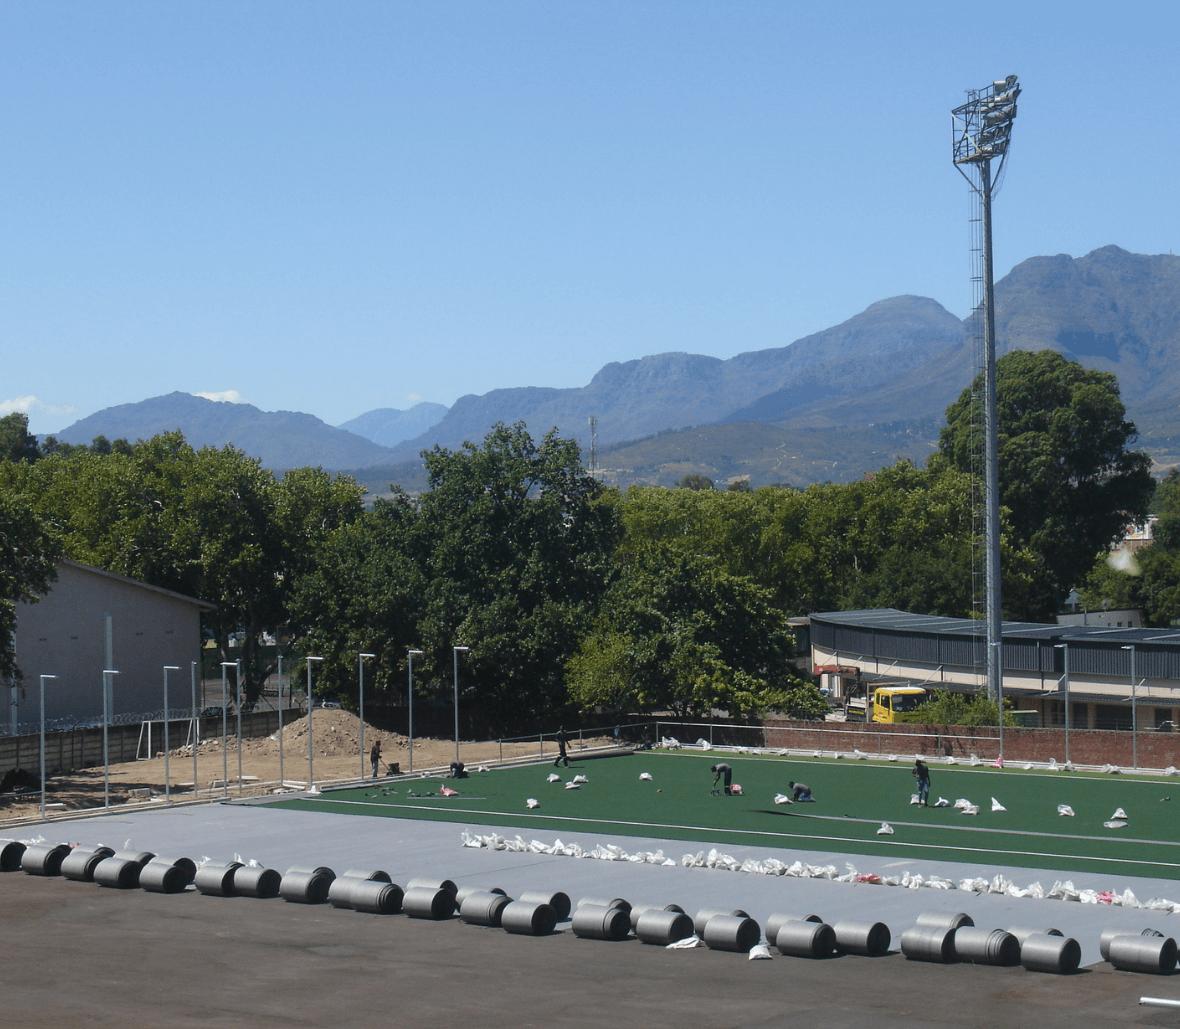 EnkaFlex_shockpad & drainage system for sportsfields_copyrights Low & Bonar_Enka Solutions (8)